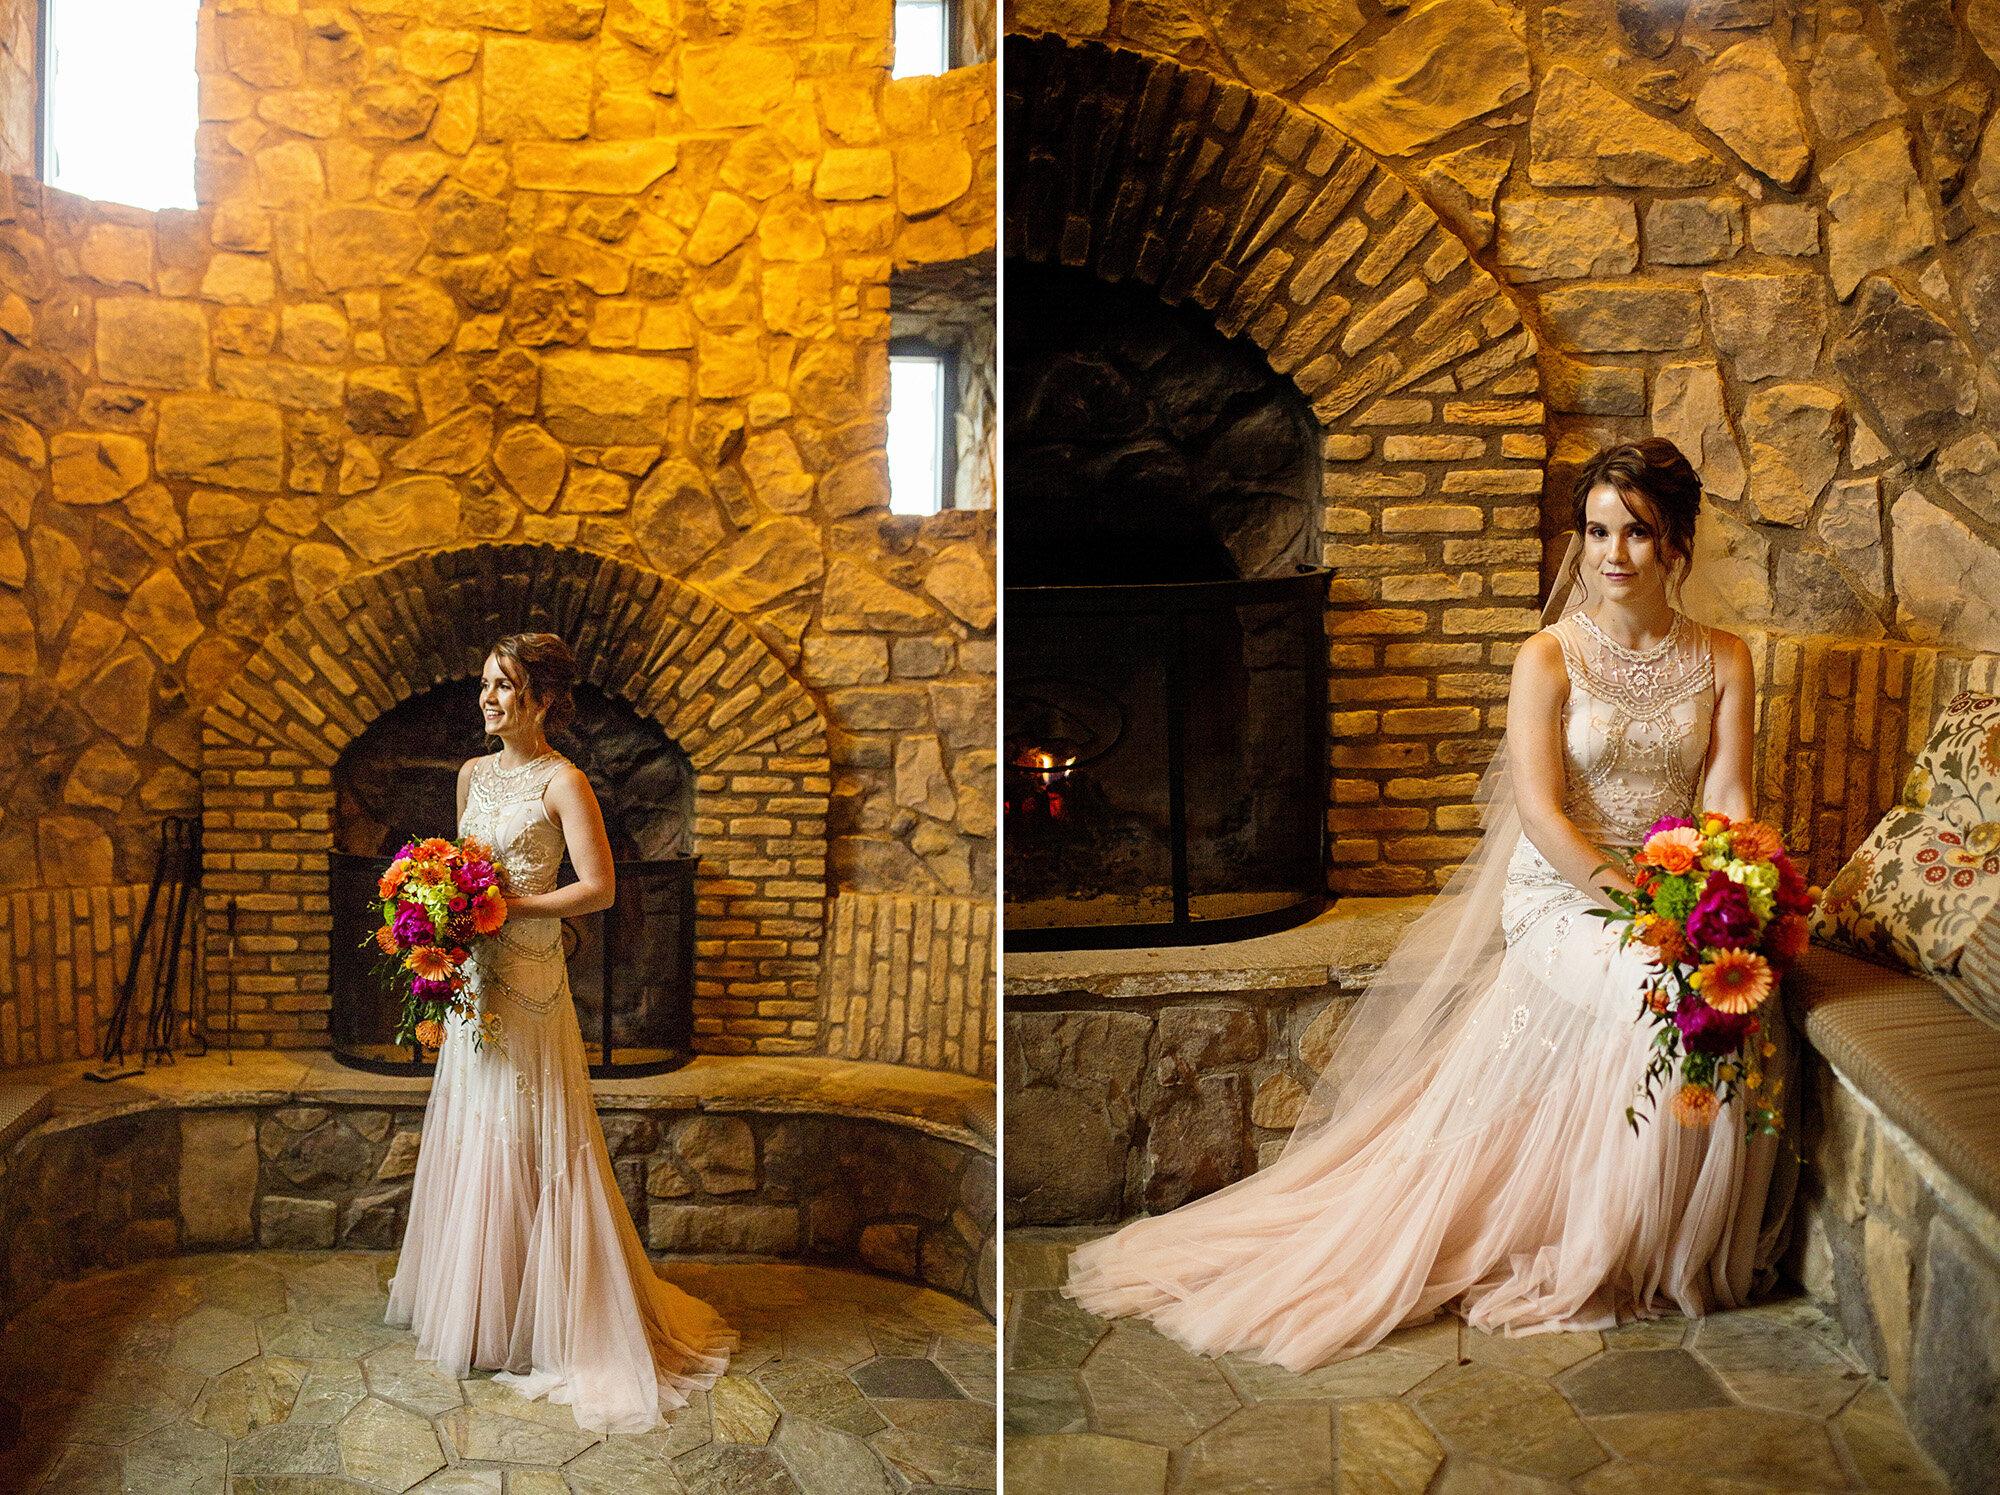 Seriously_Sabrina_Photography_Colorado_Springs_Club_at_Flying_Horse_Destination_Wedding_ODwyer19.jpg